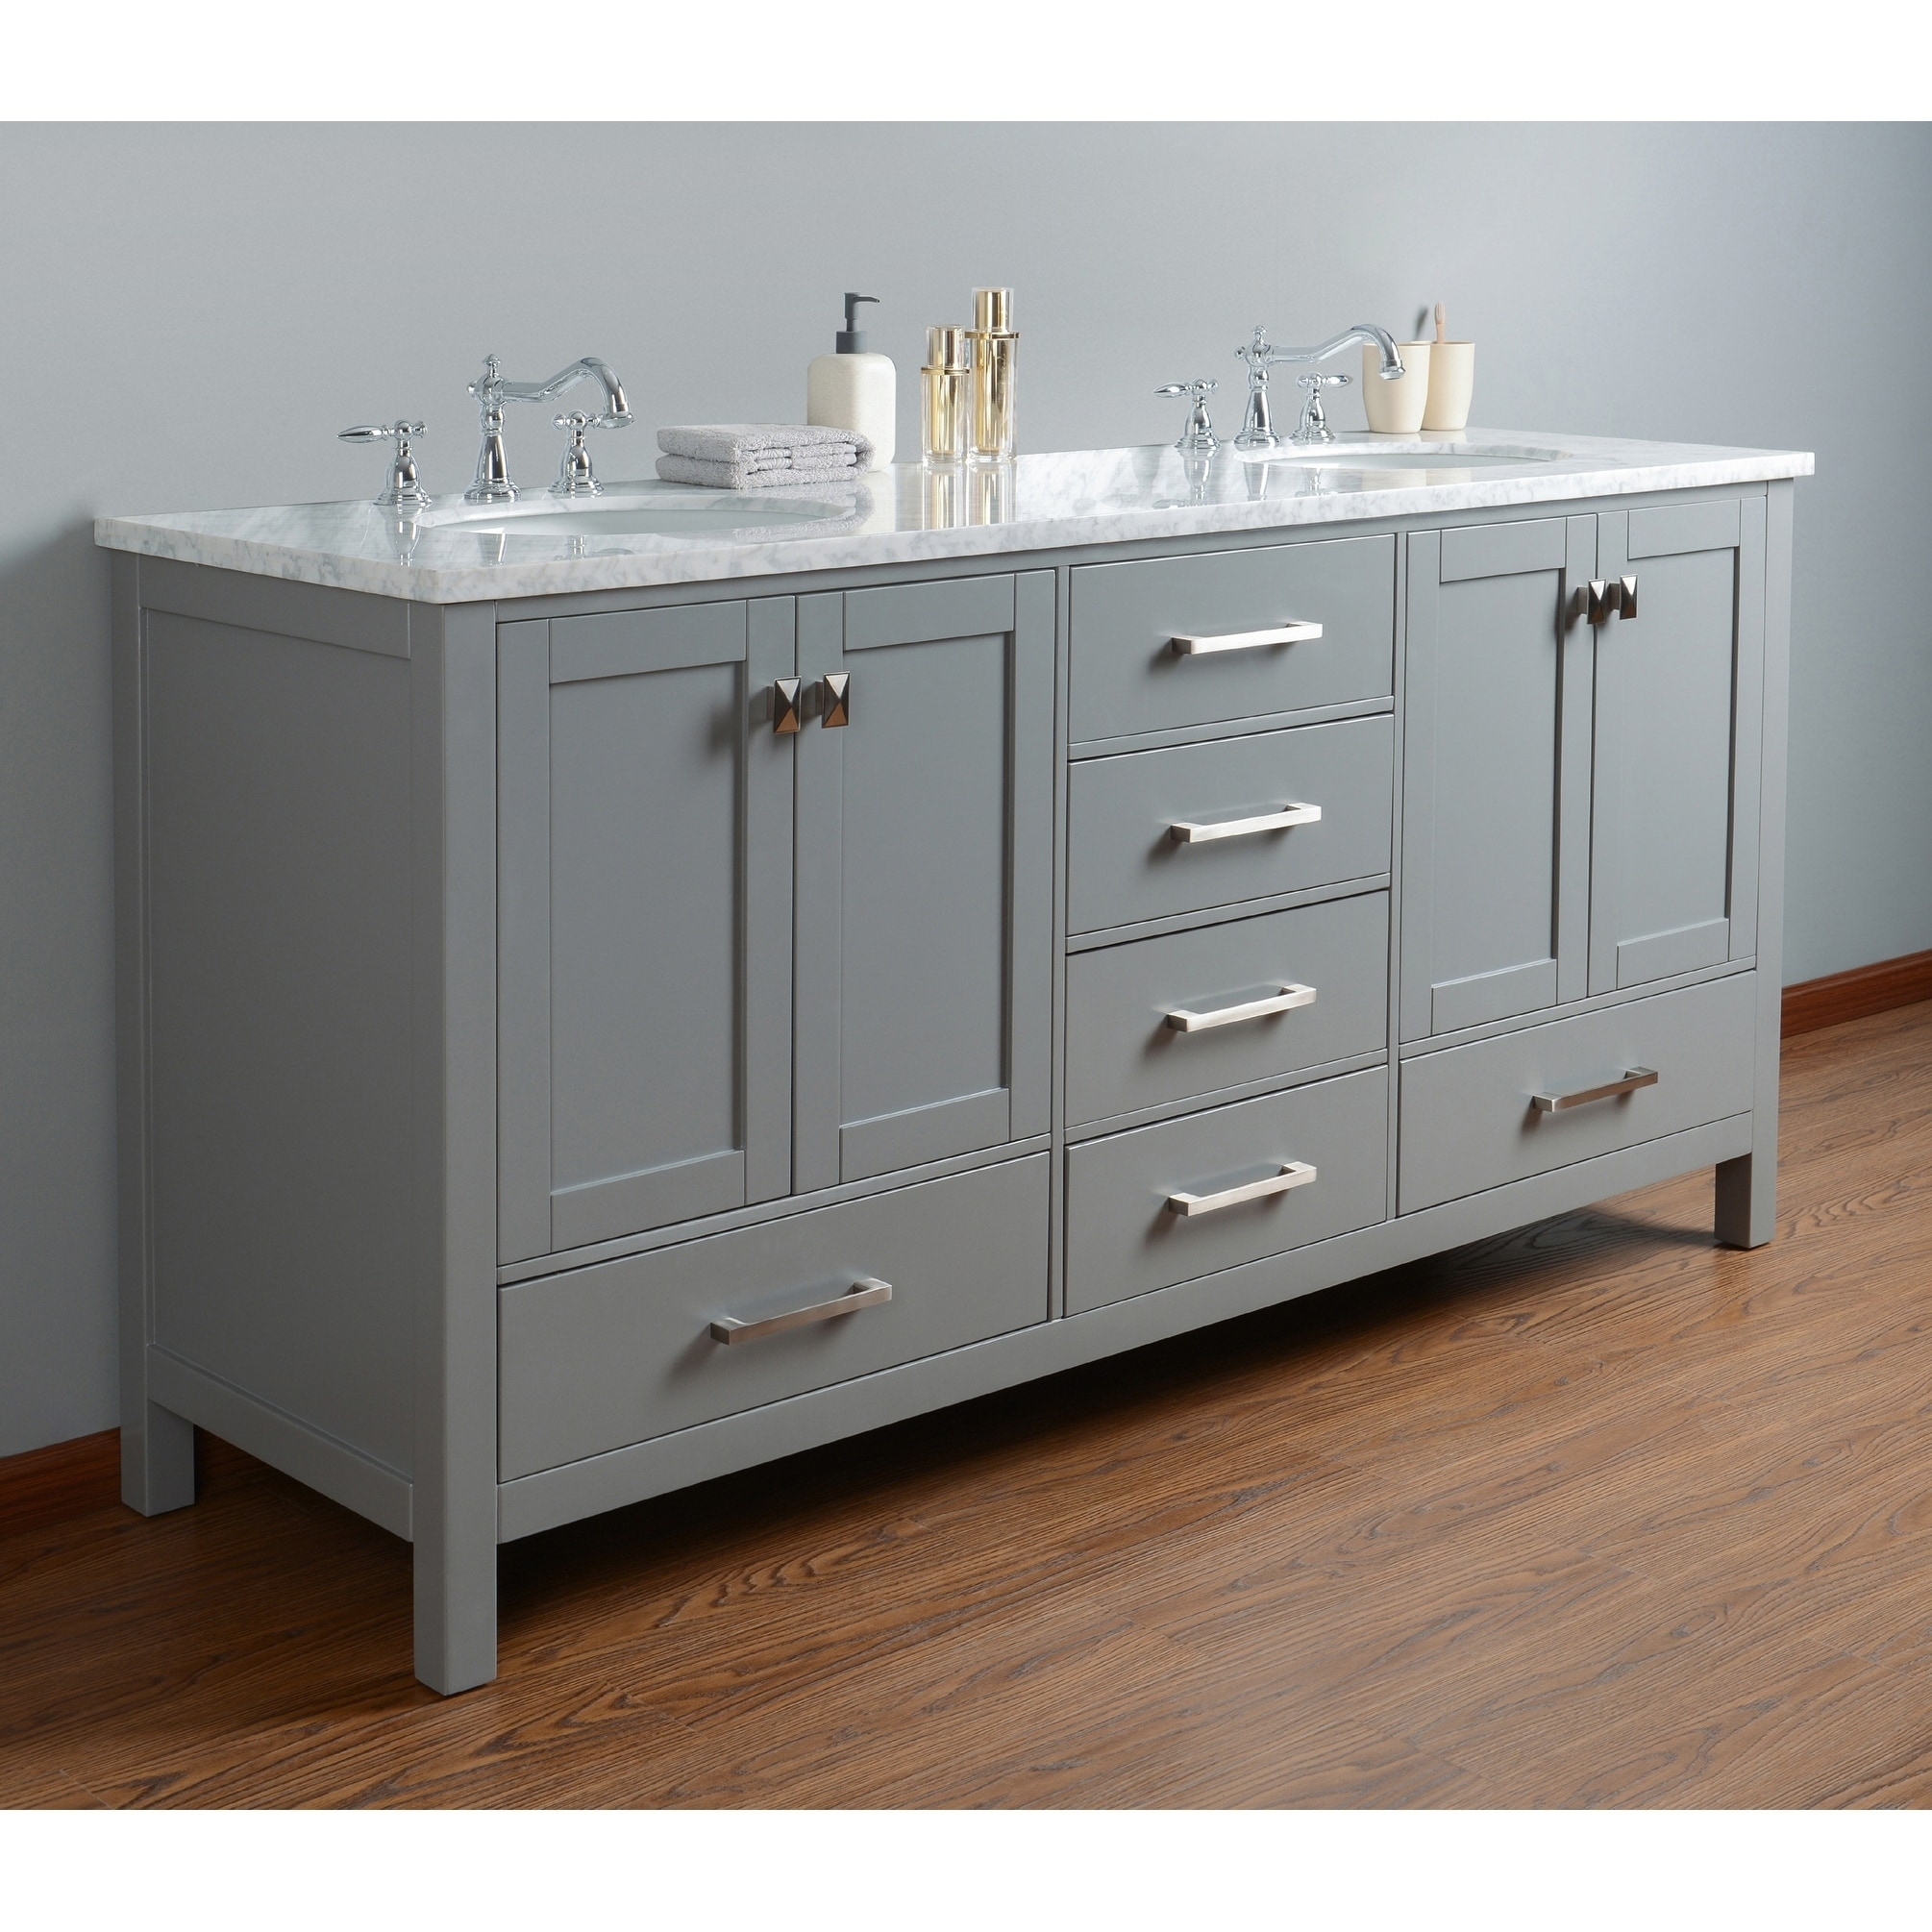 Sets bathroom vanity ari kitchen second - Stufurhome 72 Inch Malibu Grey Double Sink Bathroom Vanity Free Shipping Today Overstock Com 17659910